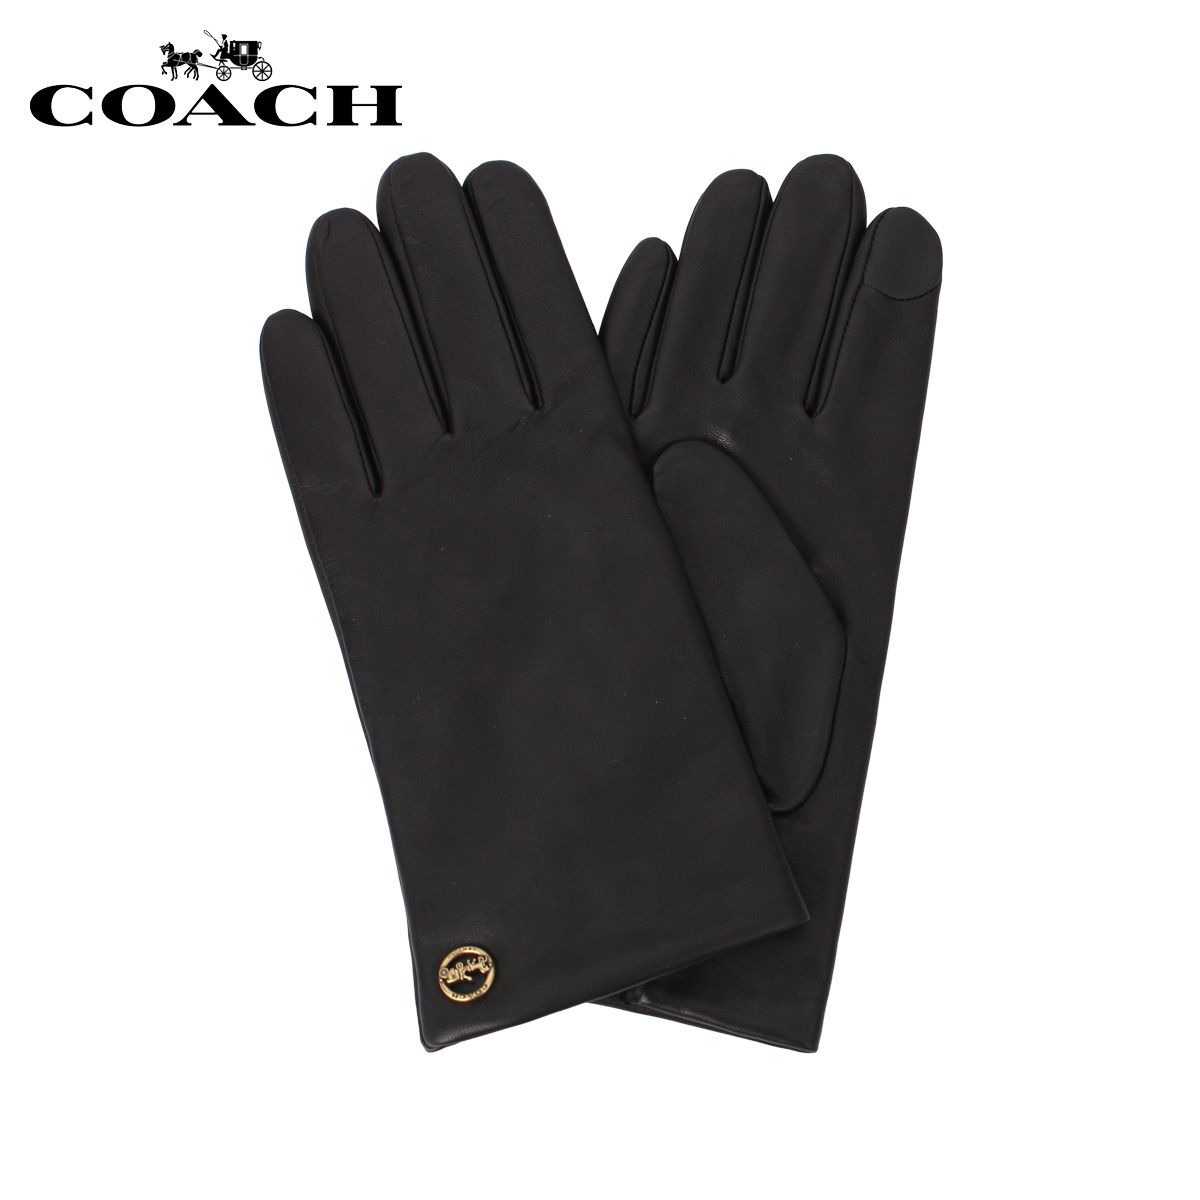 COACH F76310-BLK コーチ 手袋 グローブ レディース 本革 スマホ ブラック 黒 [11/25 新入荷]